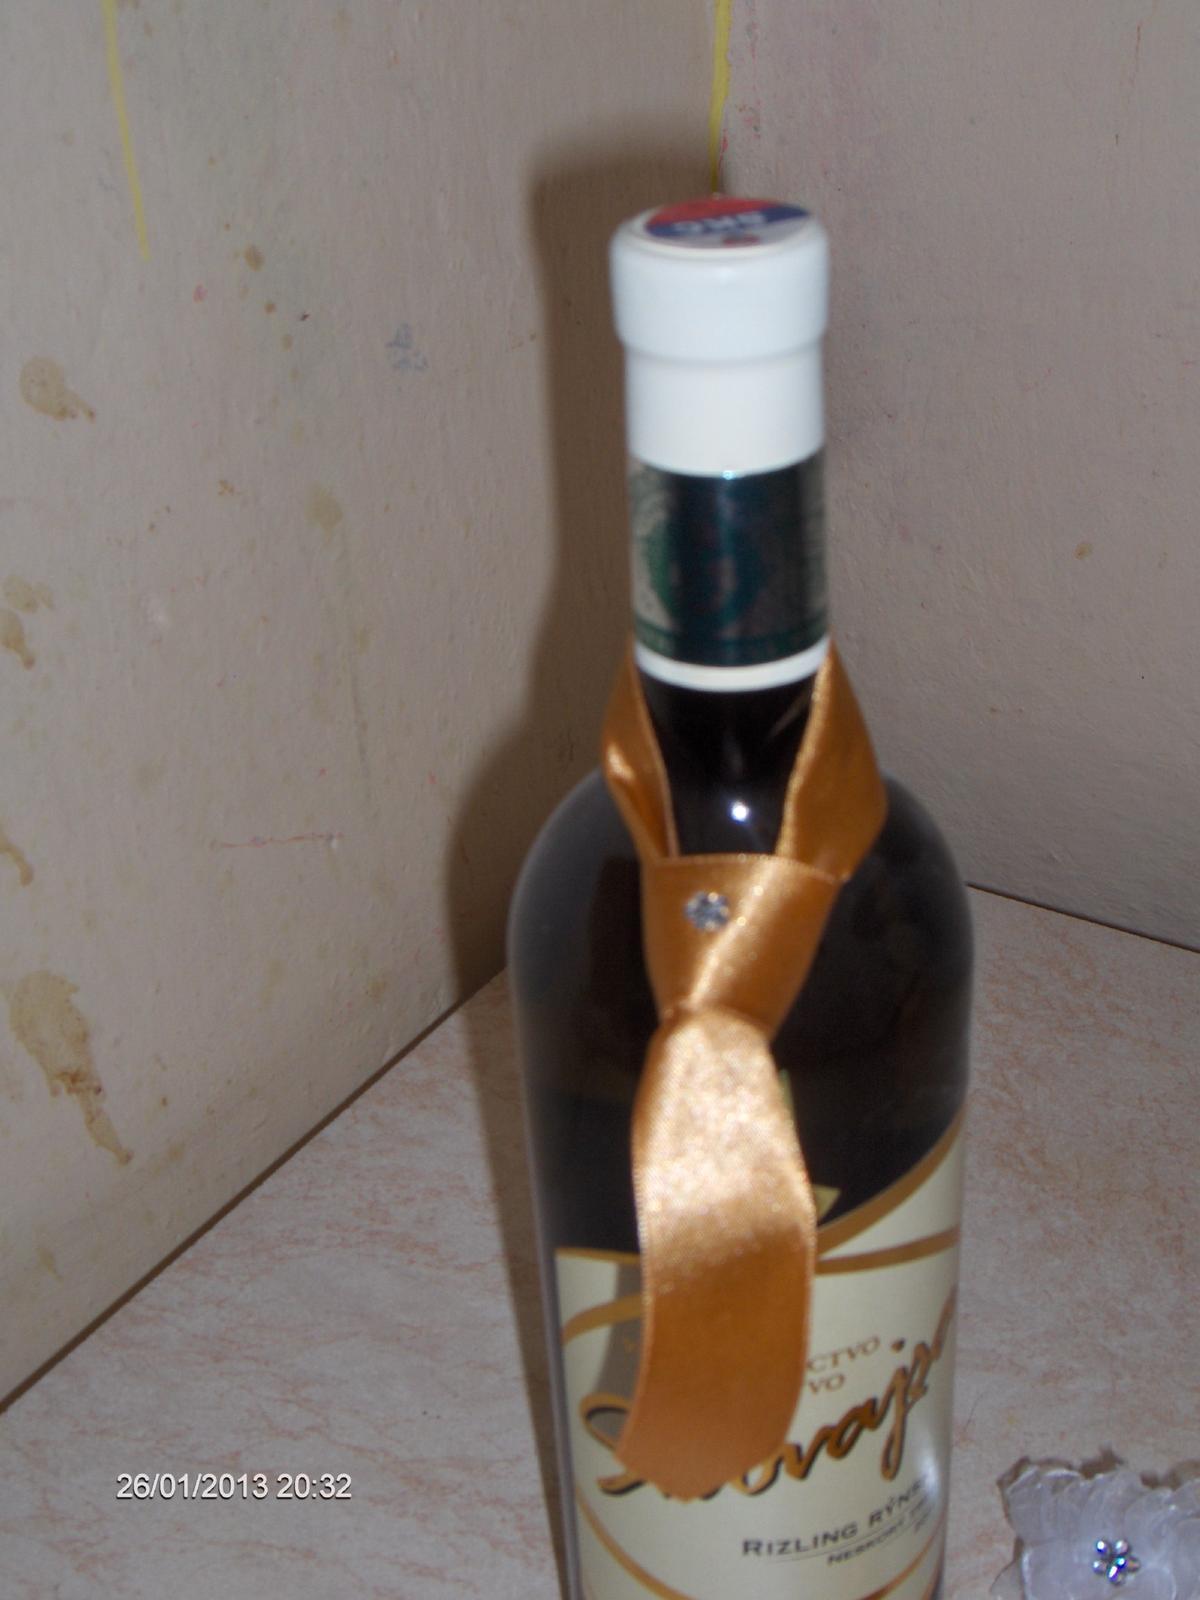 ozdoby na fľašu nepoužité - Obrázok č. 2